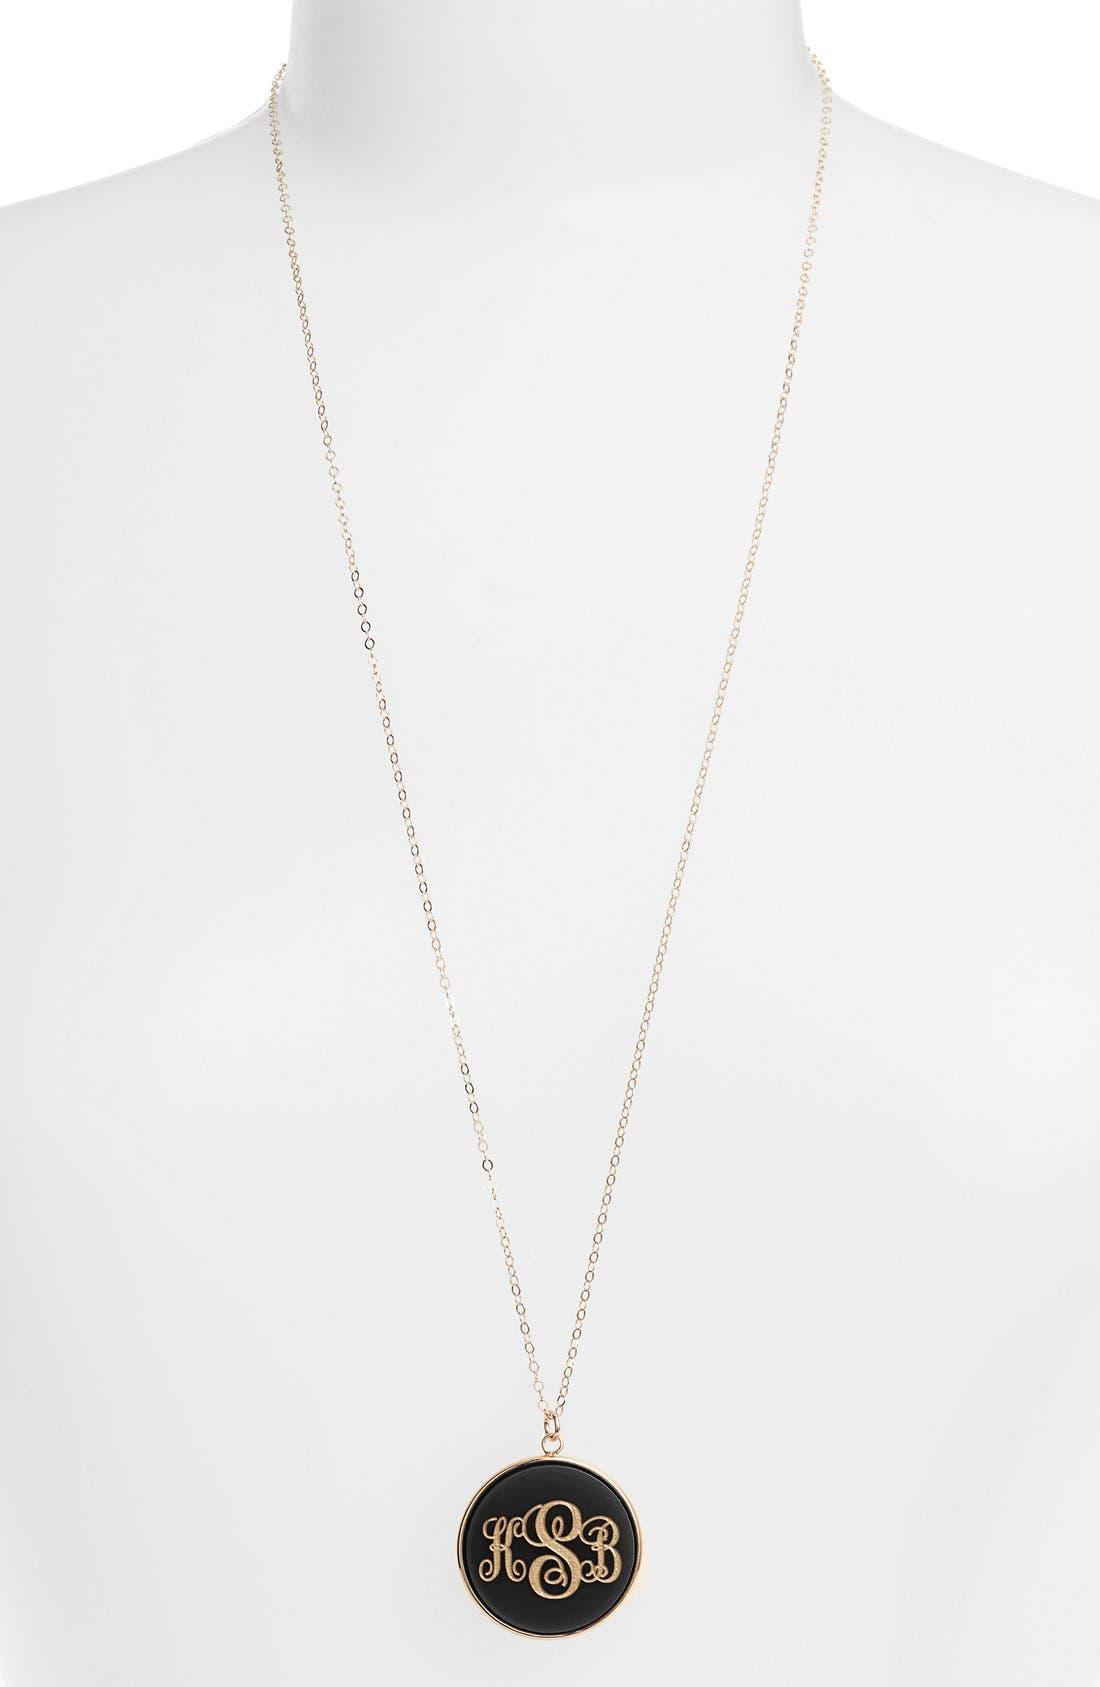 'Vineyard' Personalized Monogram Pendant Necklace,                         Main,                         color, Black